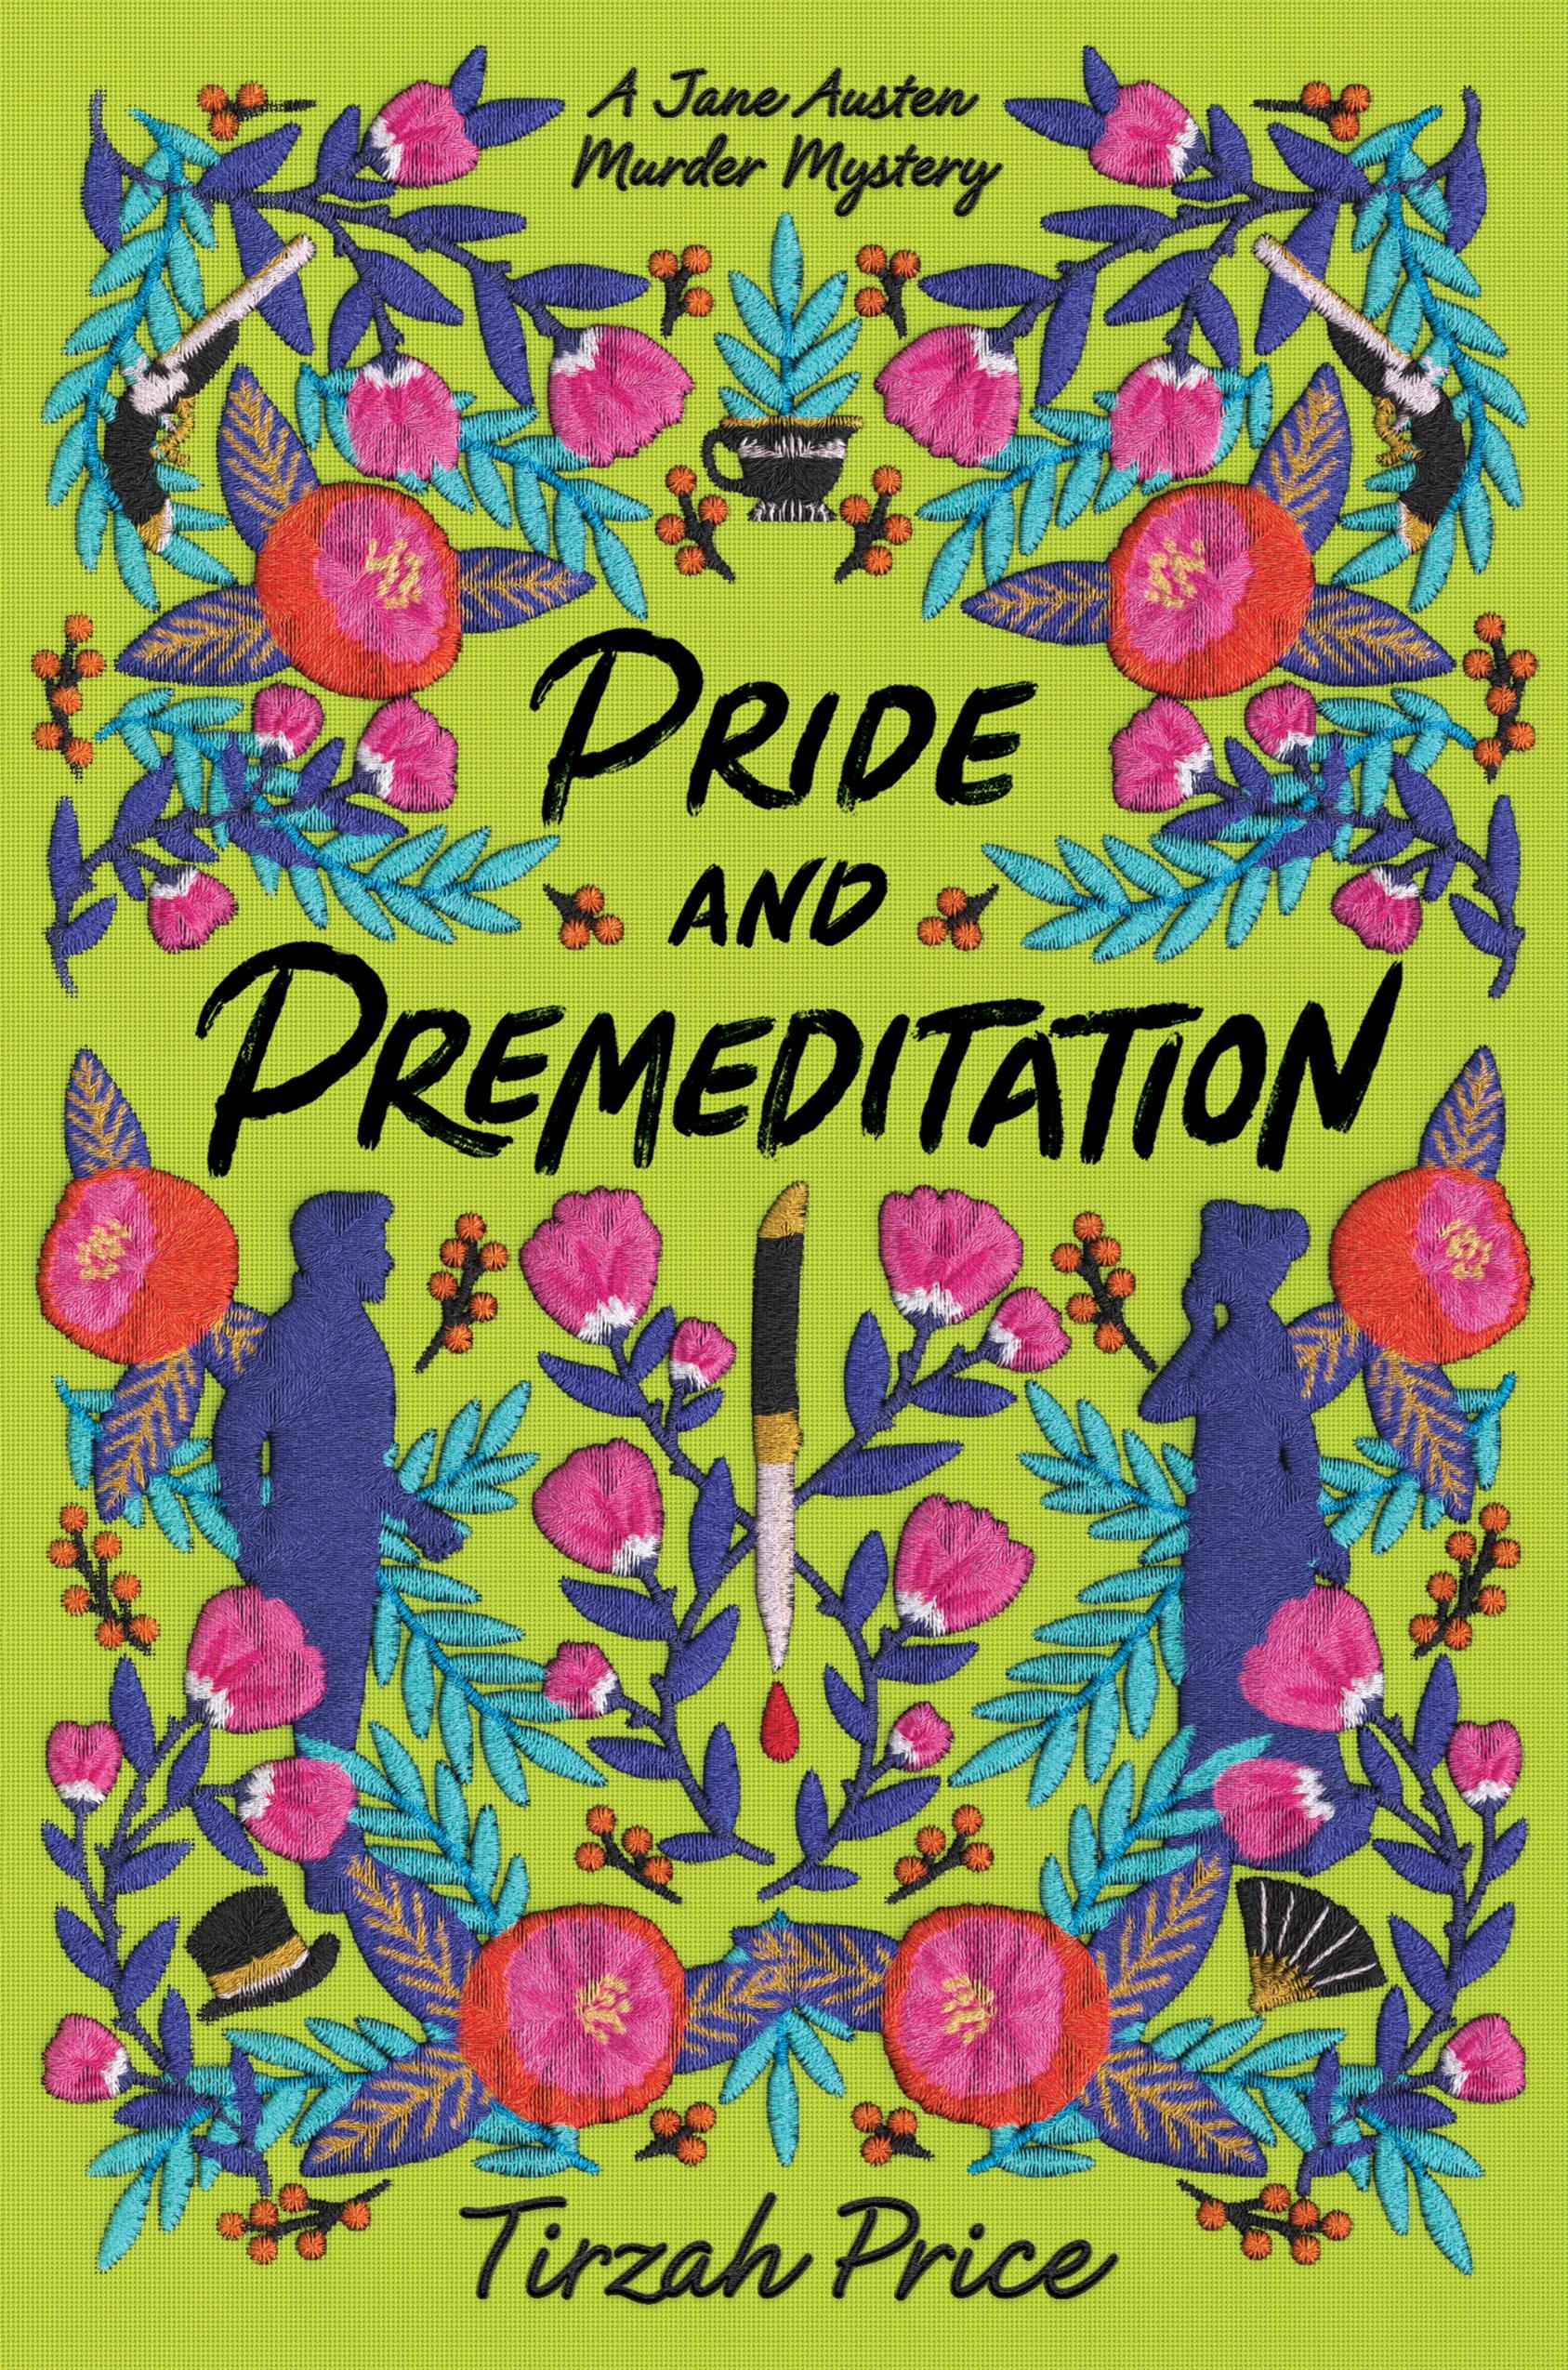 pridepremeditationn